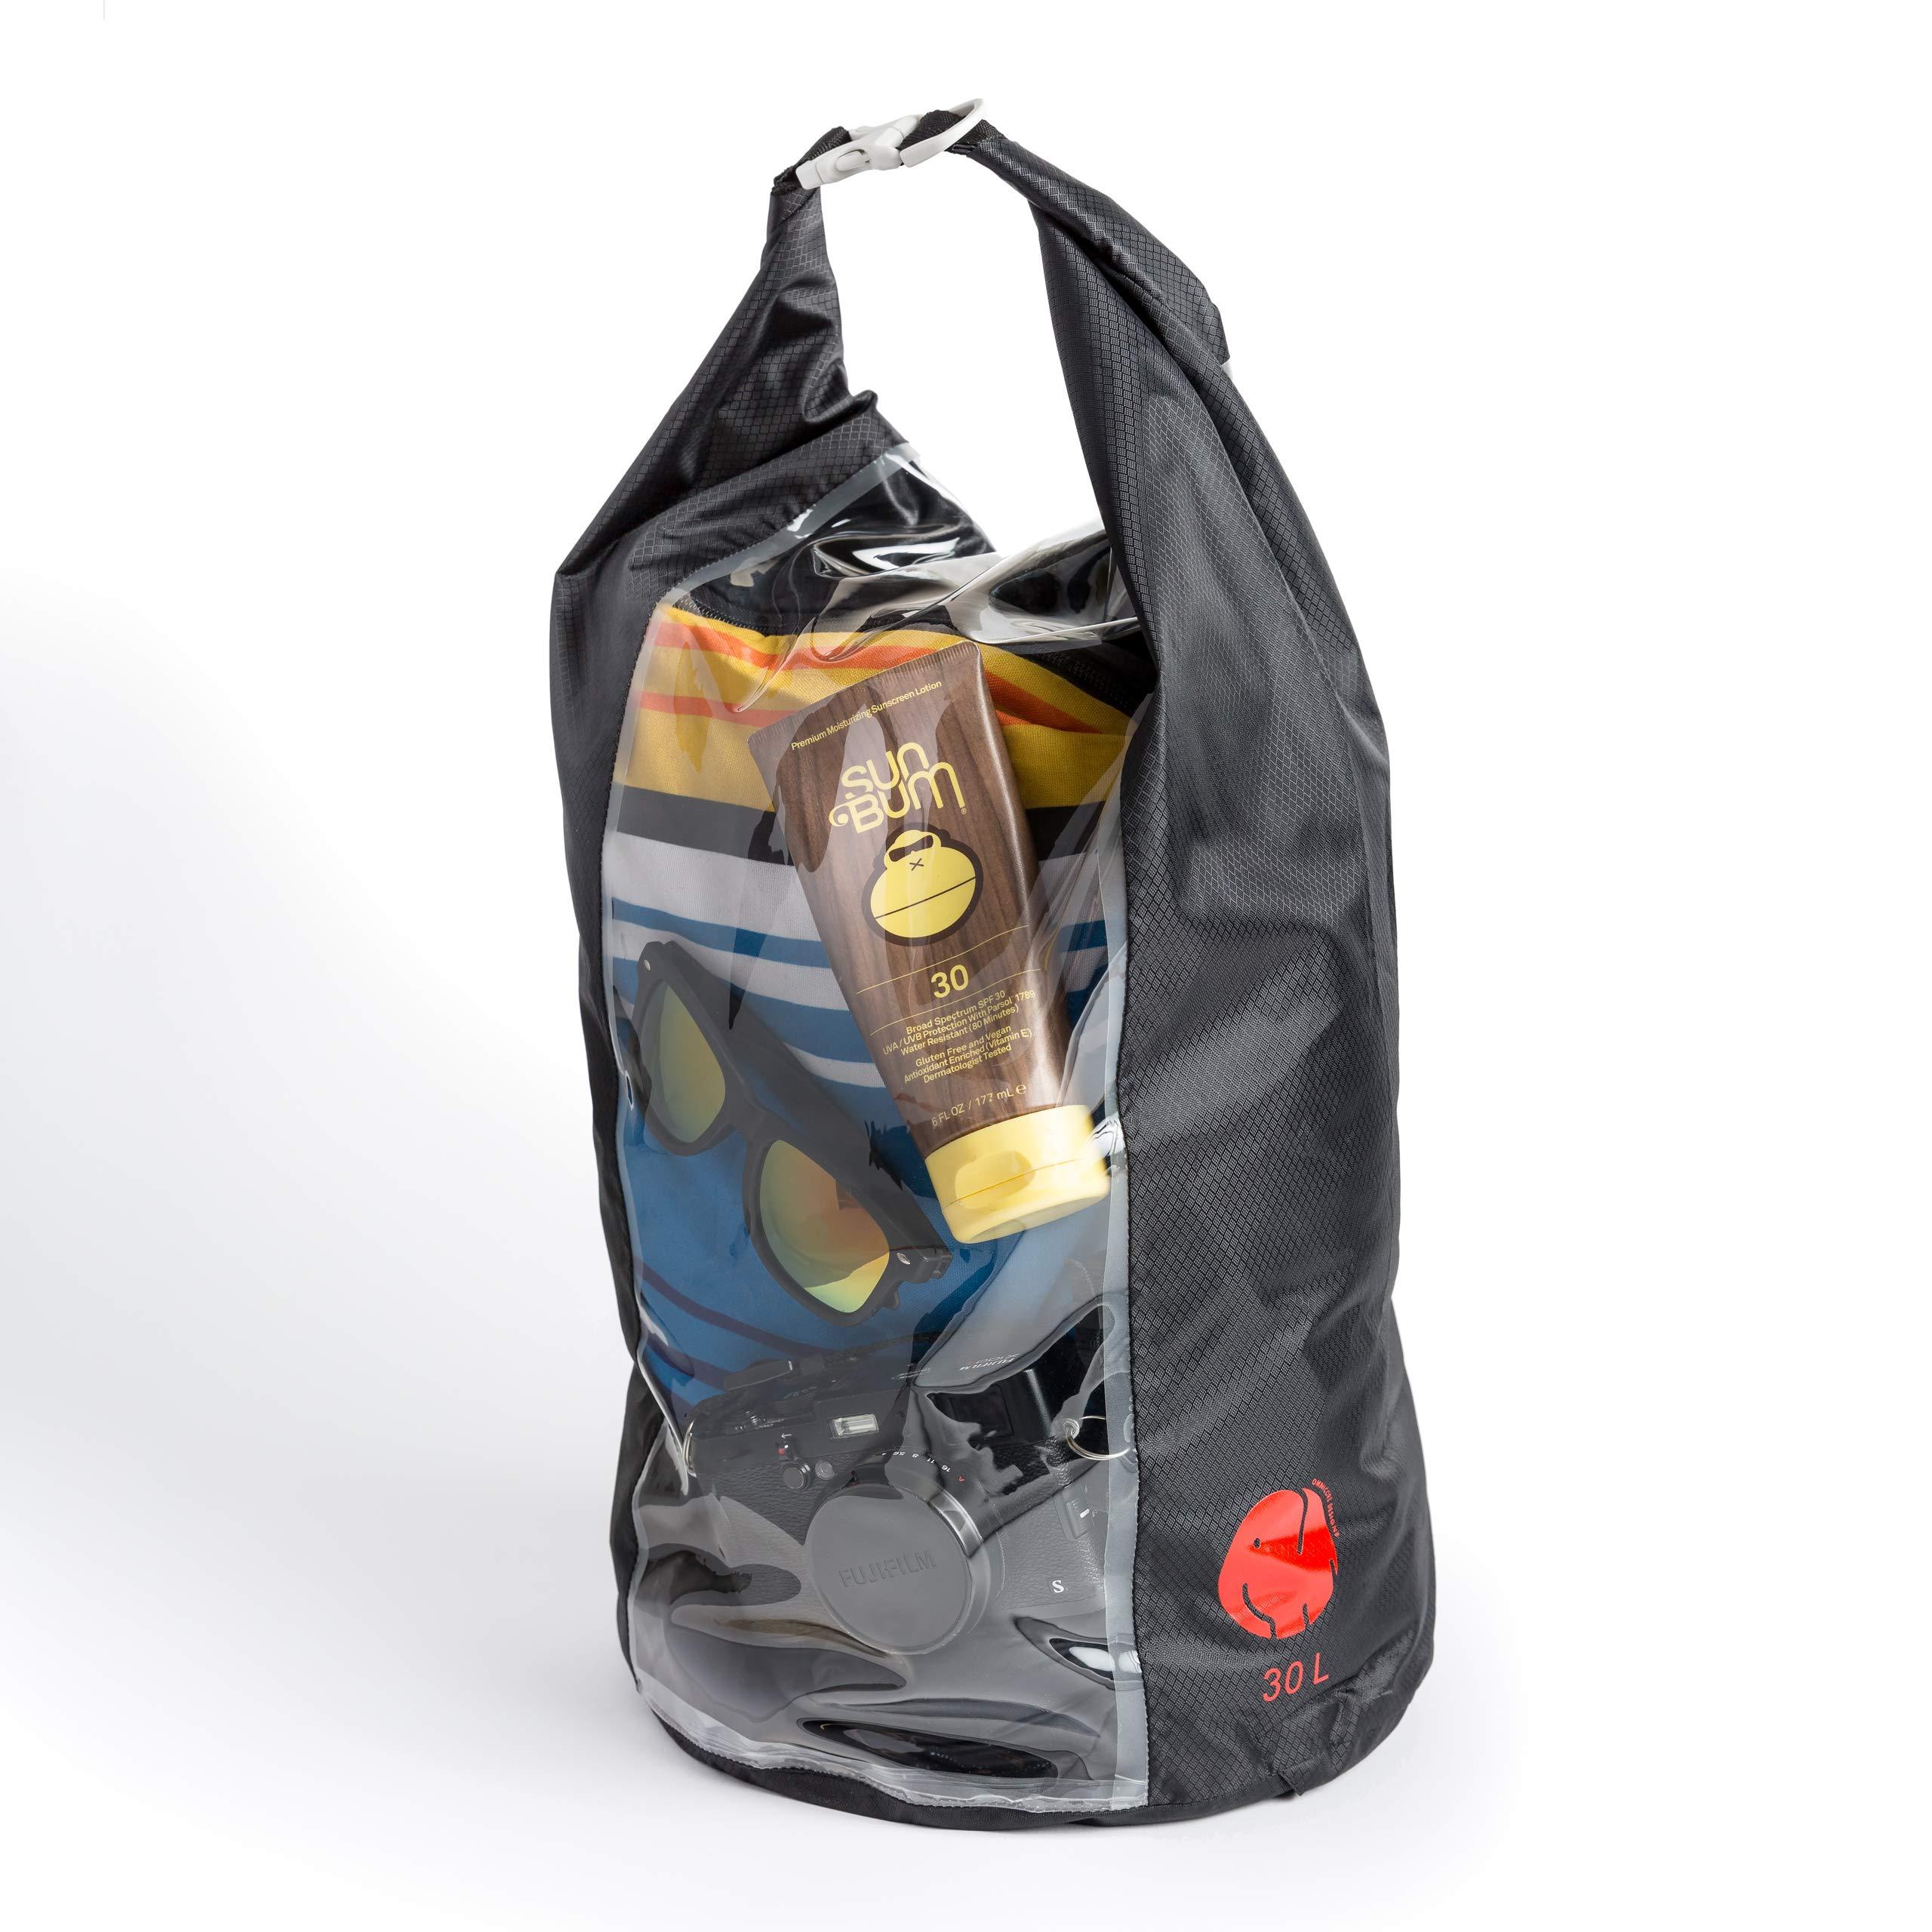 OmniCore Designs Peak-A-Boo Floating Rolltop Waterproof Dry Bag (30L) by OmniCore Designs